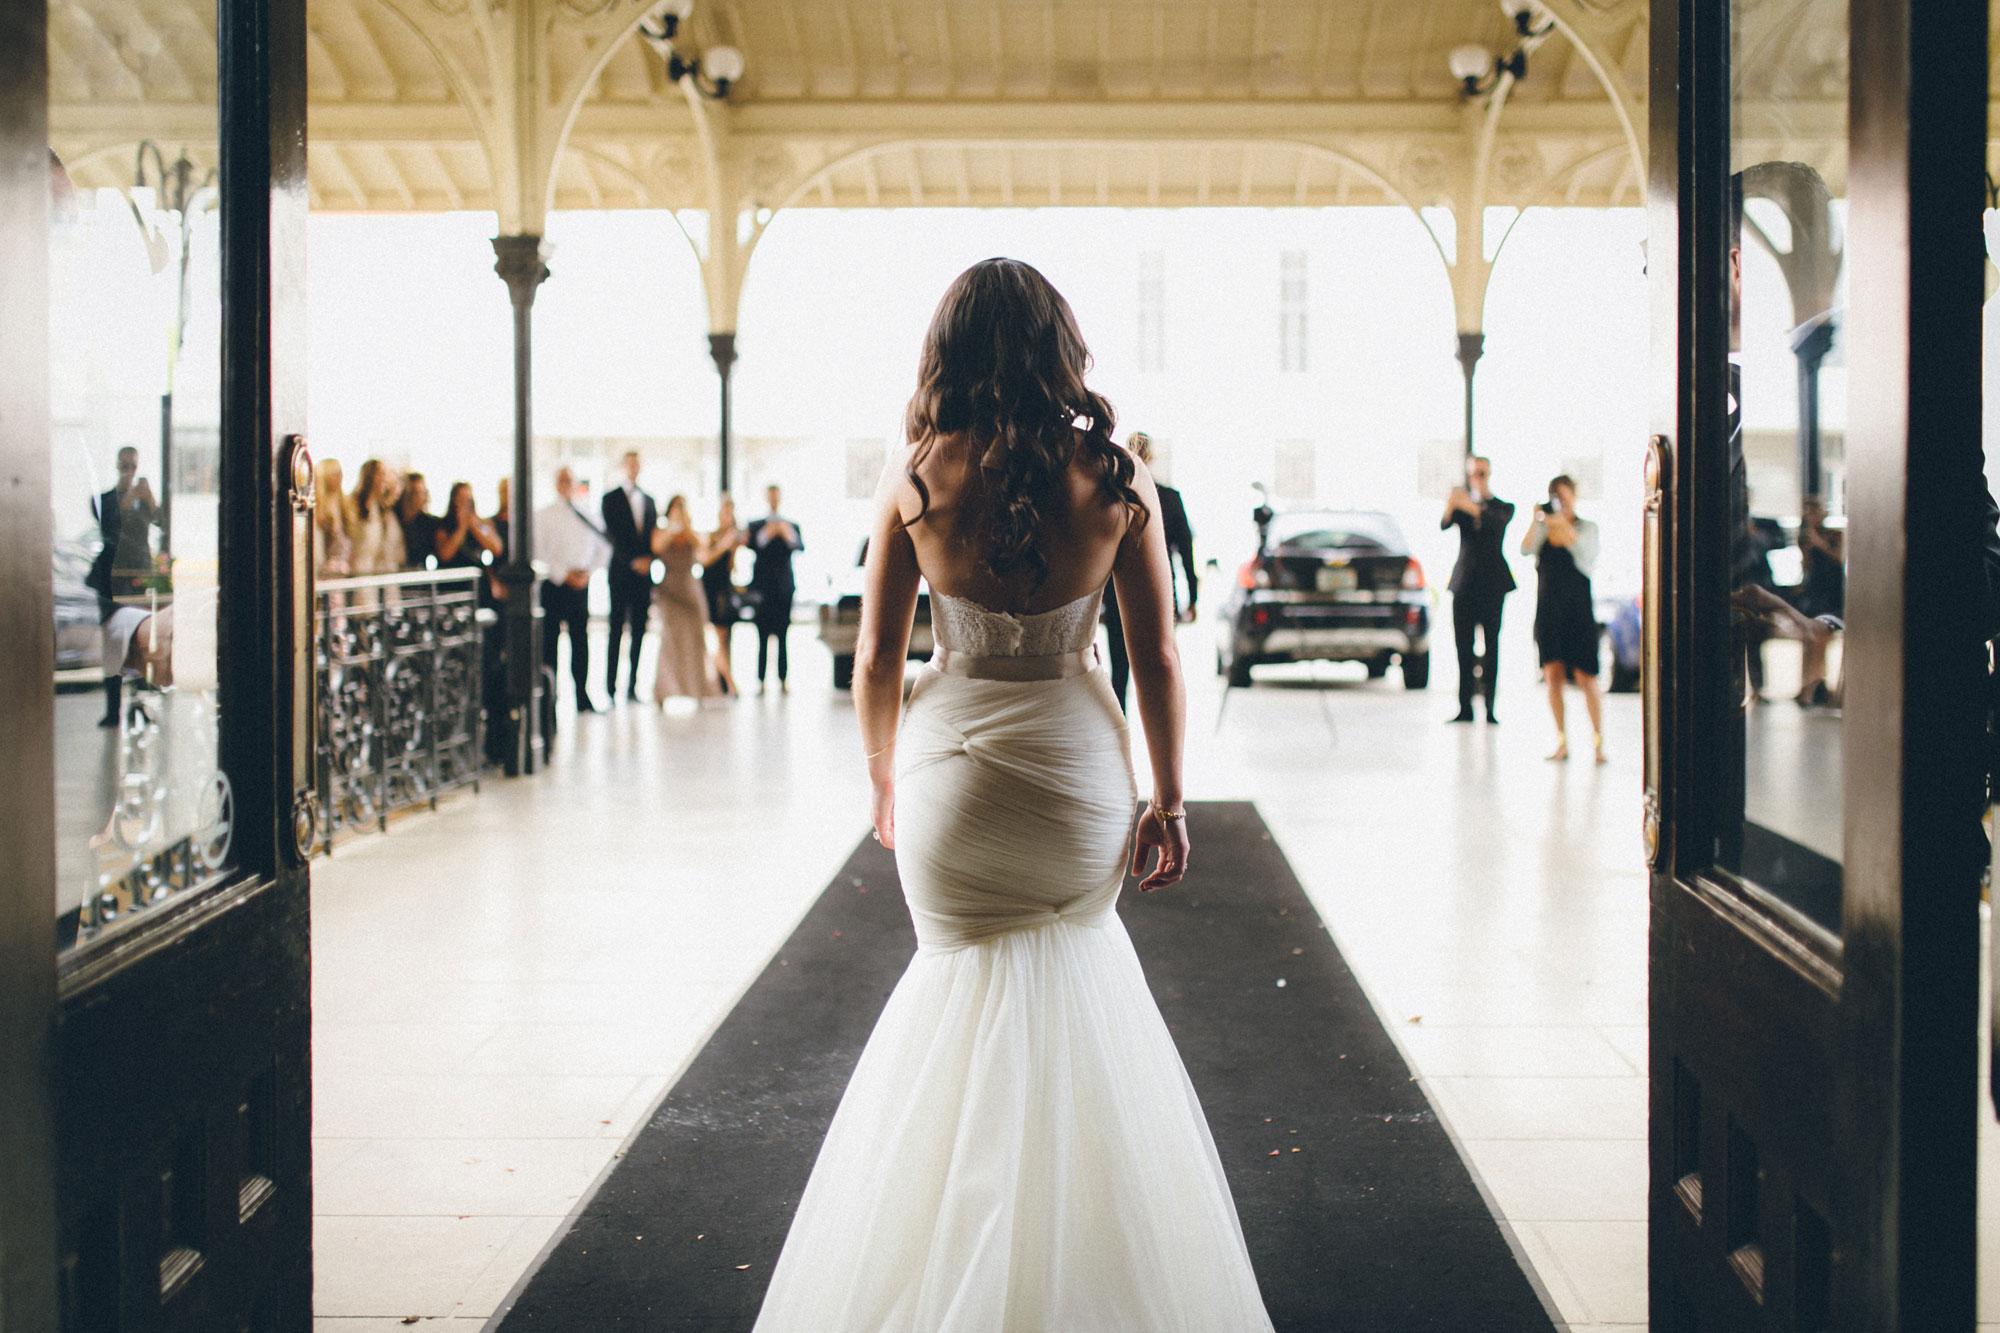 Me & Mr. Jones Wedding, First Look at Union Station Hotel, Bridal Portrait, Nashville Wedding